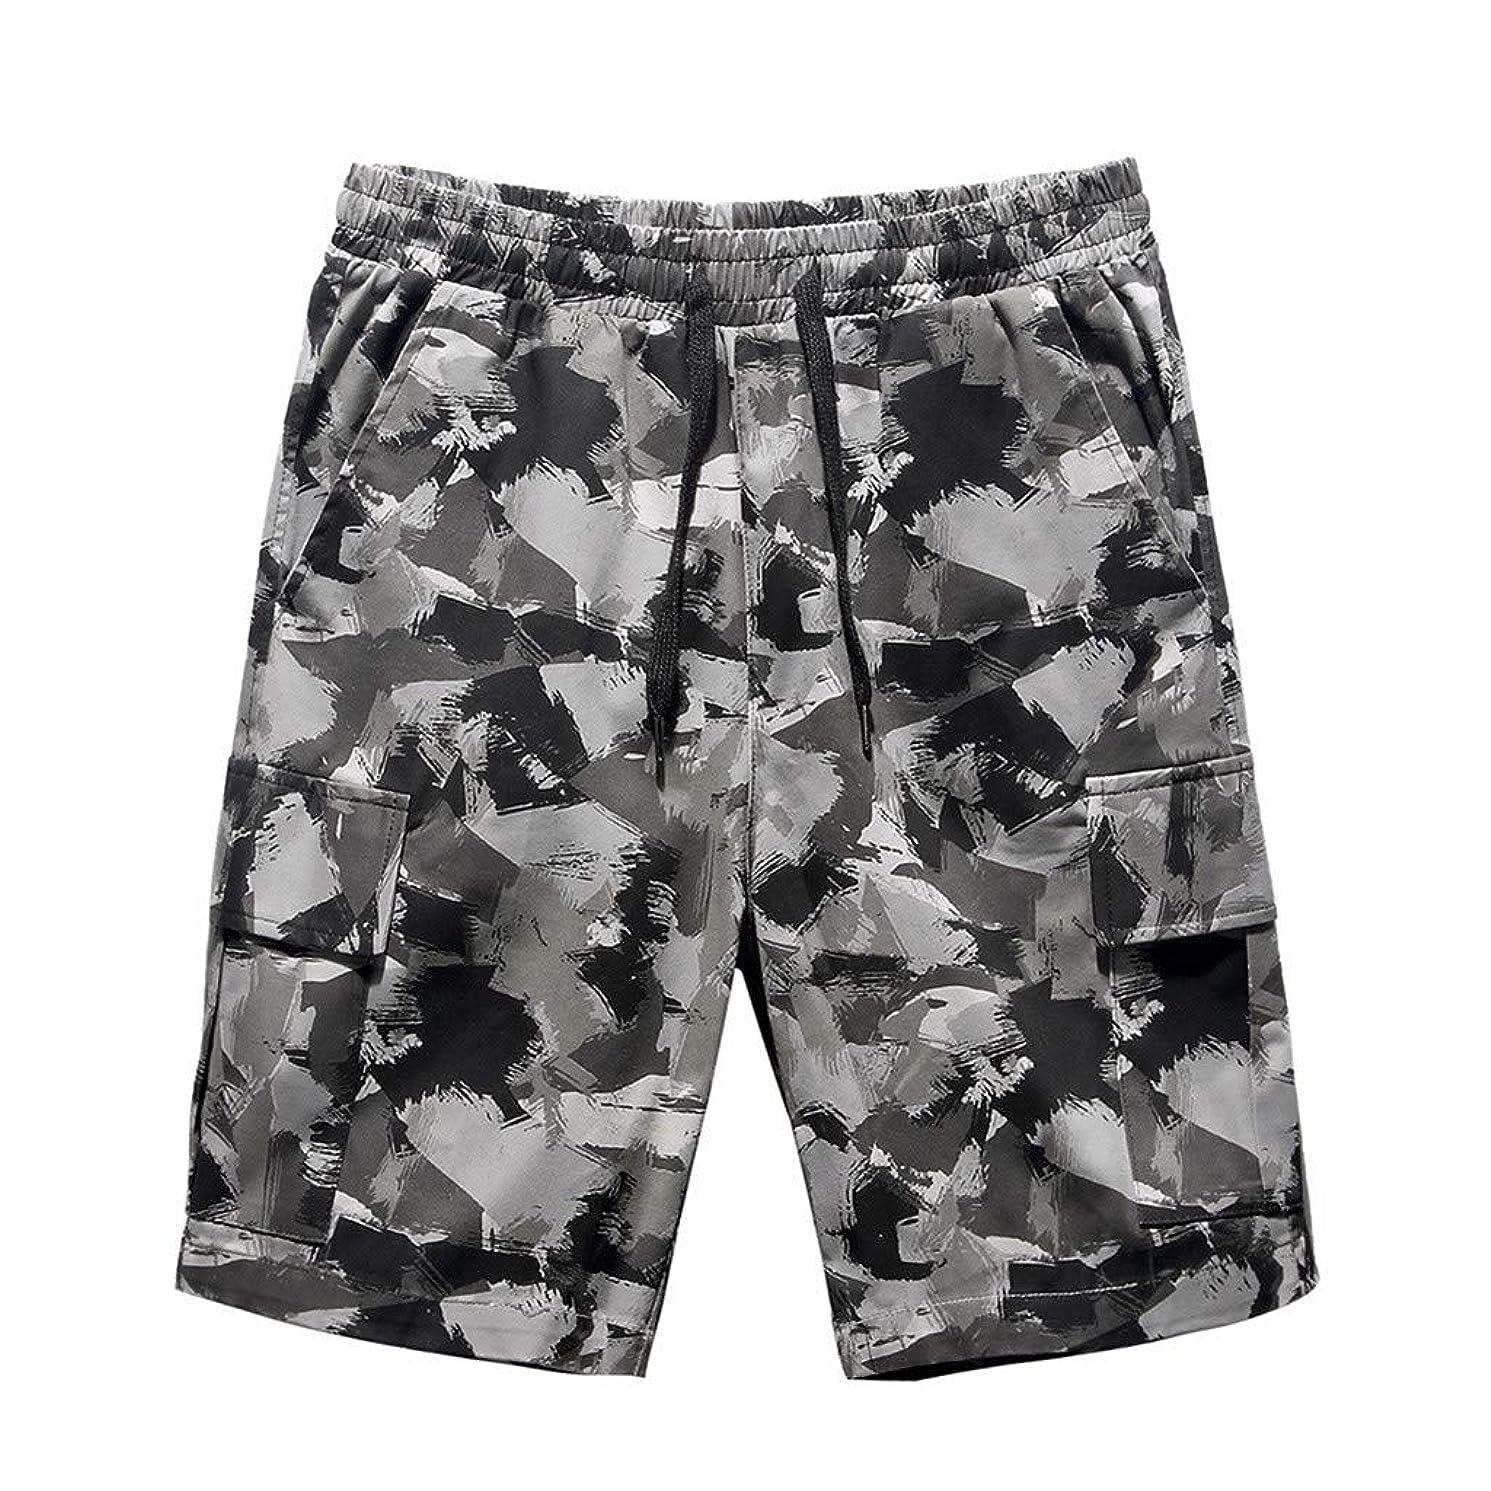 JJLIKER Men's Camouflage Multi-Pocket Capri Cargo Pants Classic Fit Casual Soft Cotton Sport Athletic Beach Pants